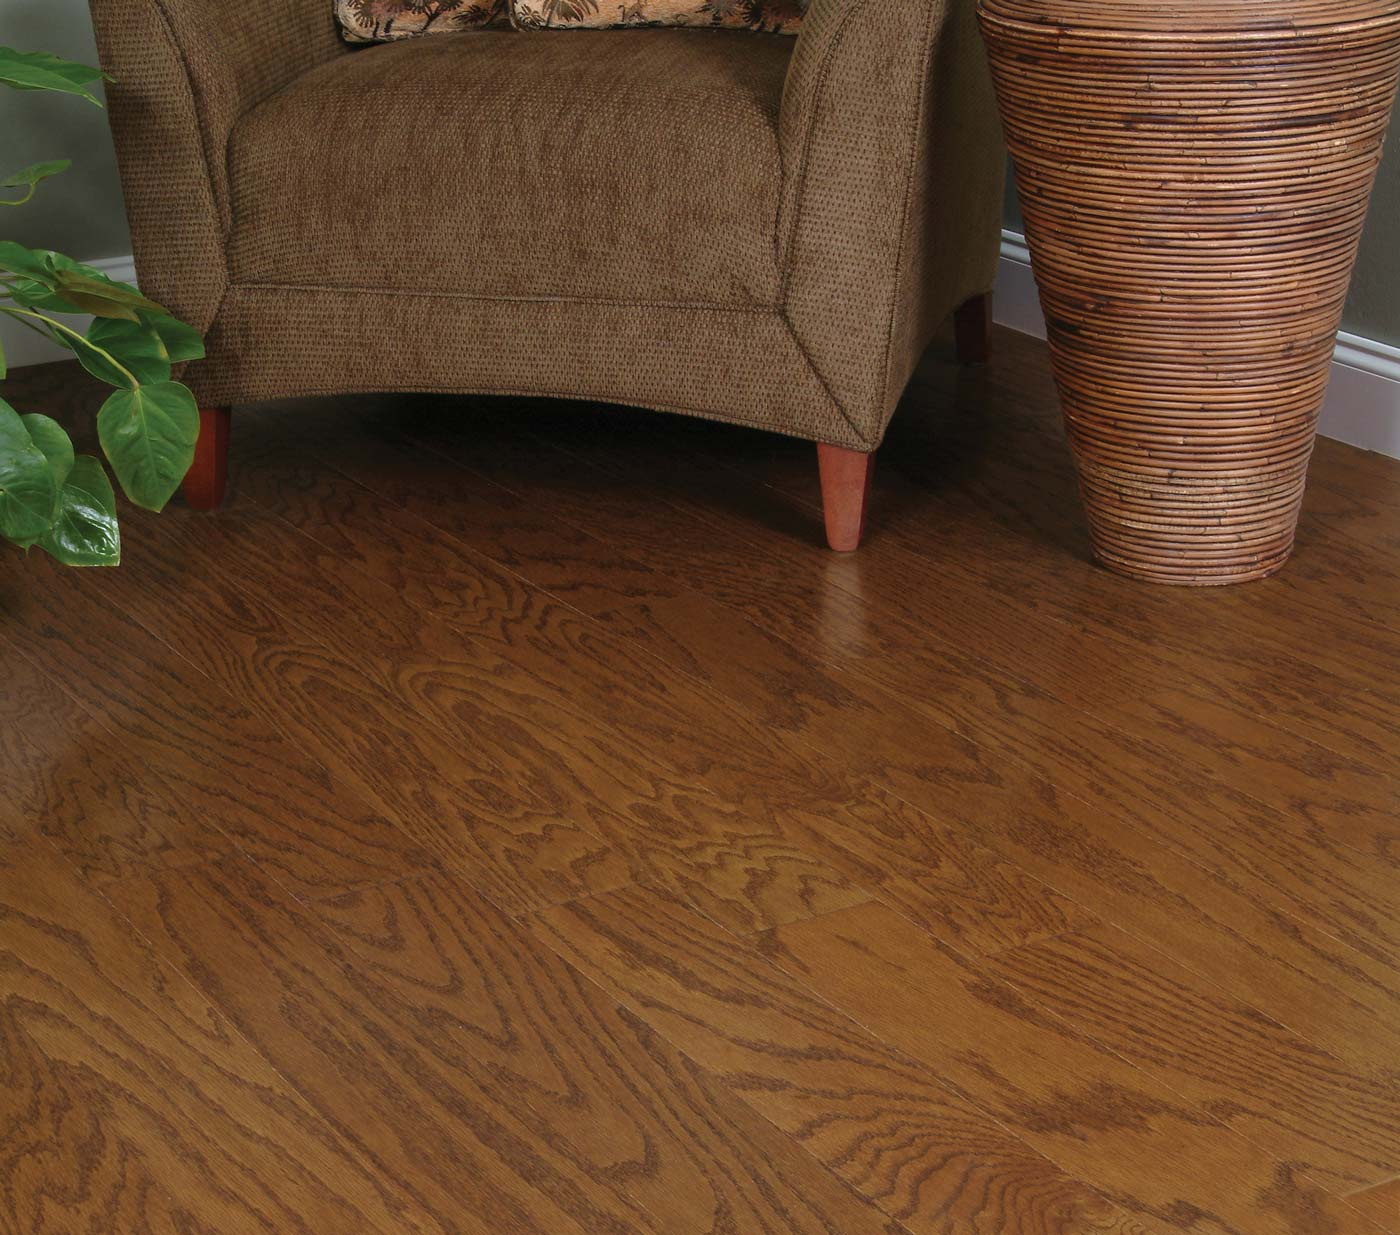 Harris tarkett engineered flooring home flooring ideas for Harris tarkett flooring